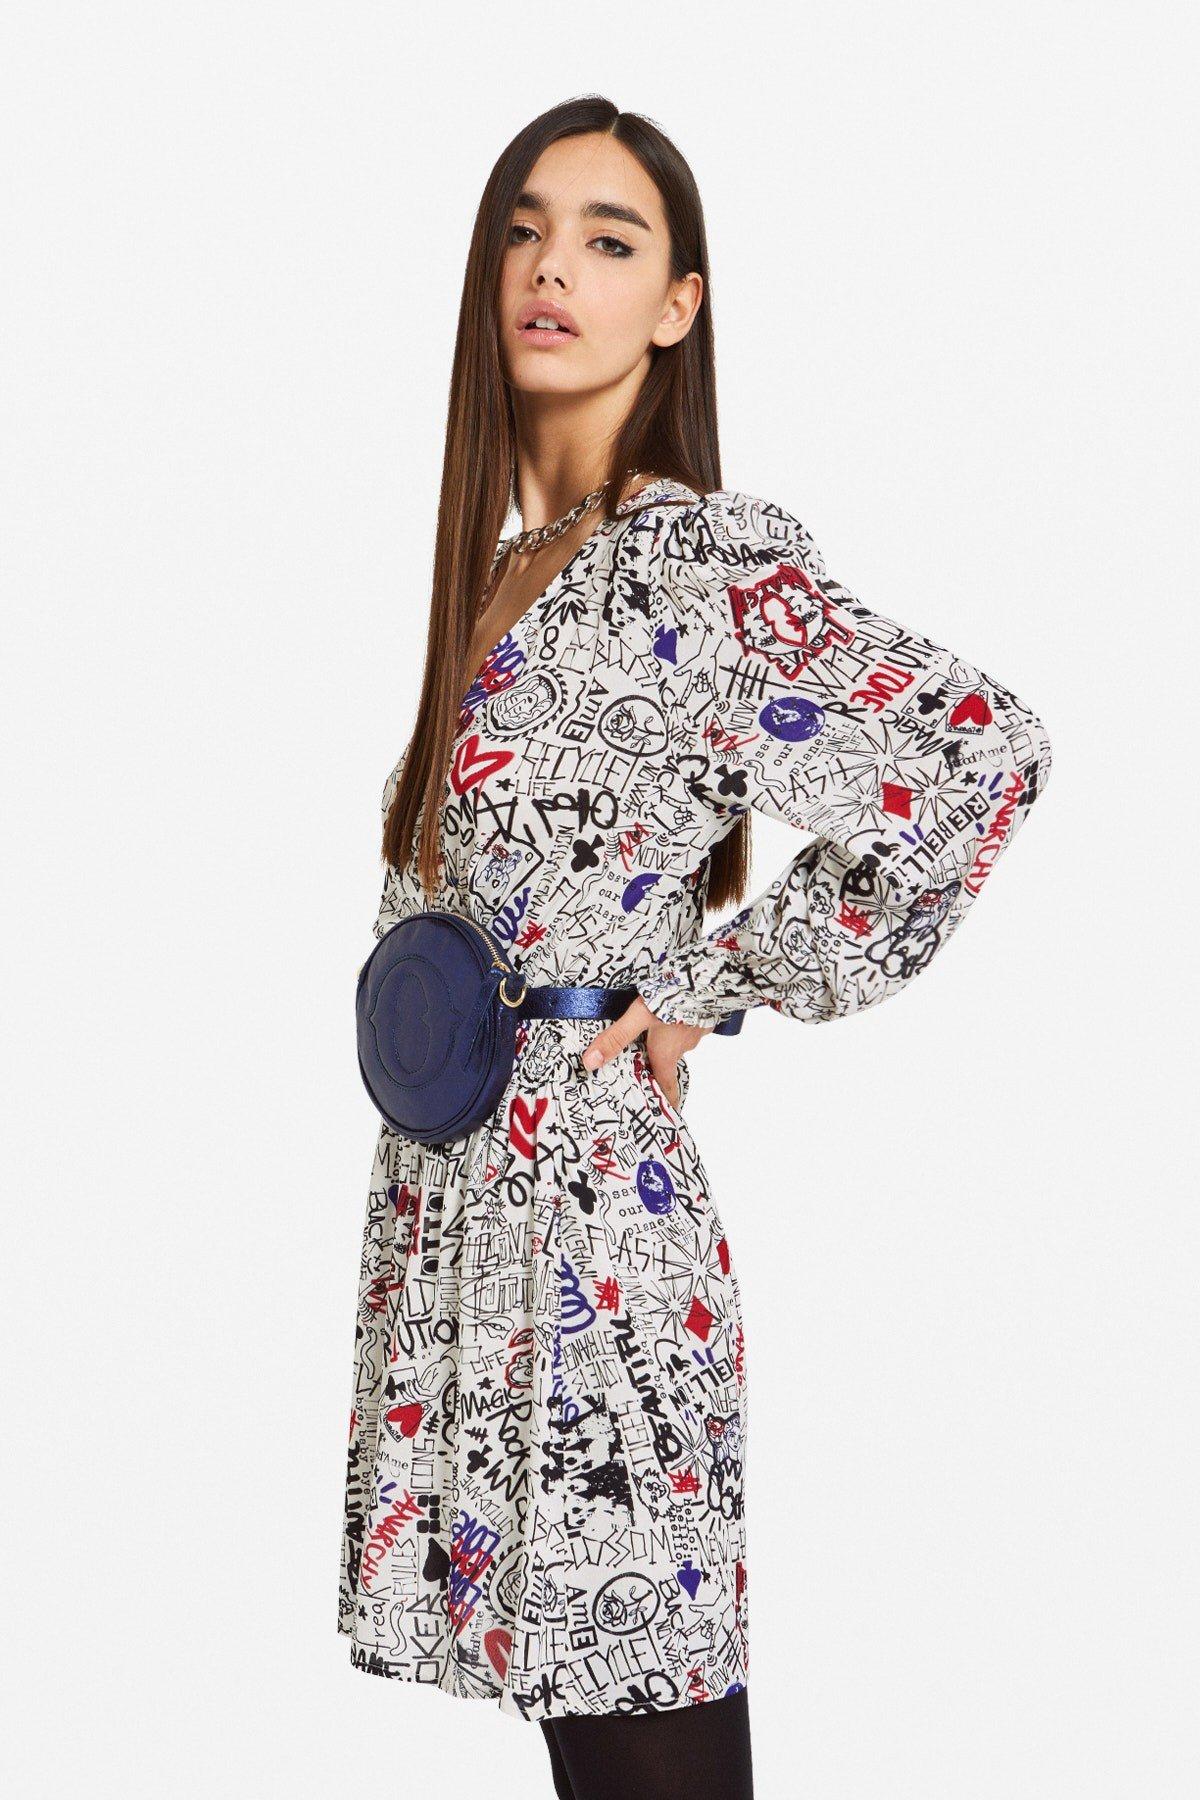 Viscose criss-cross mini dress